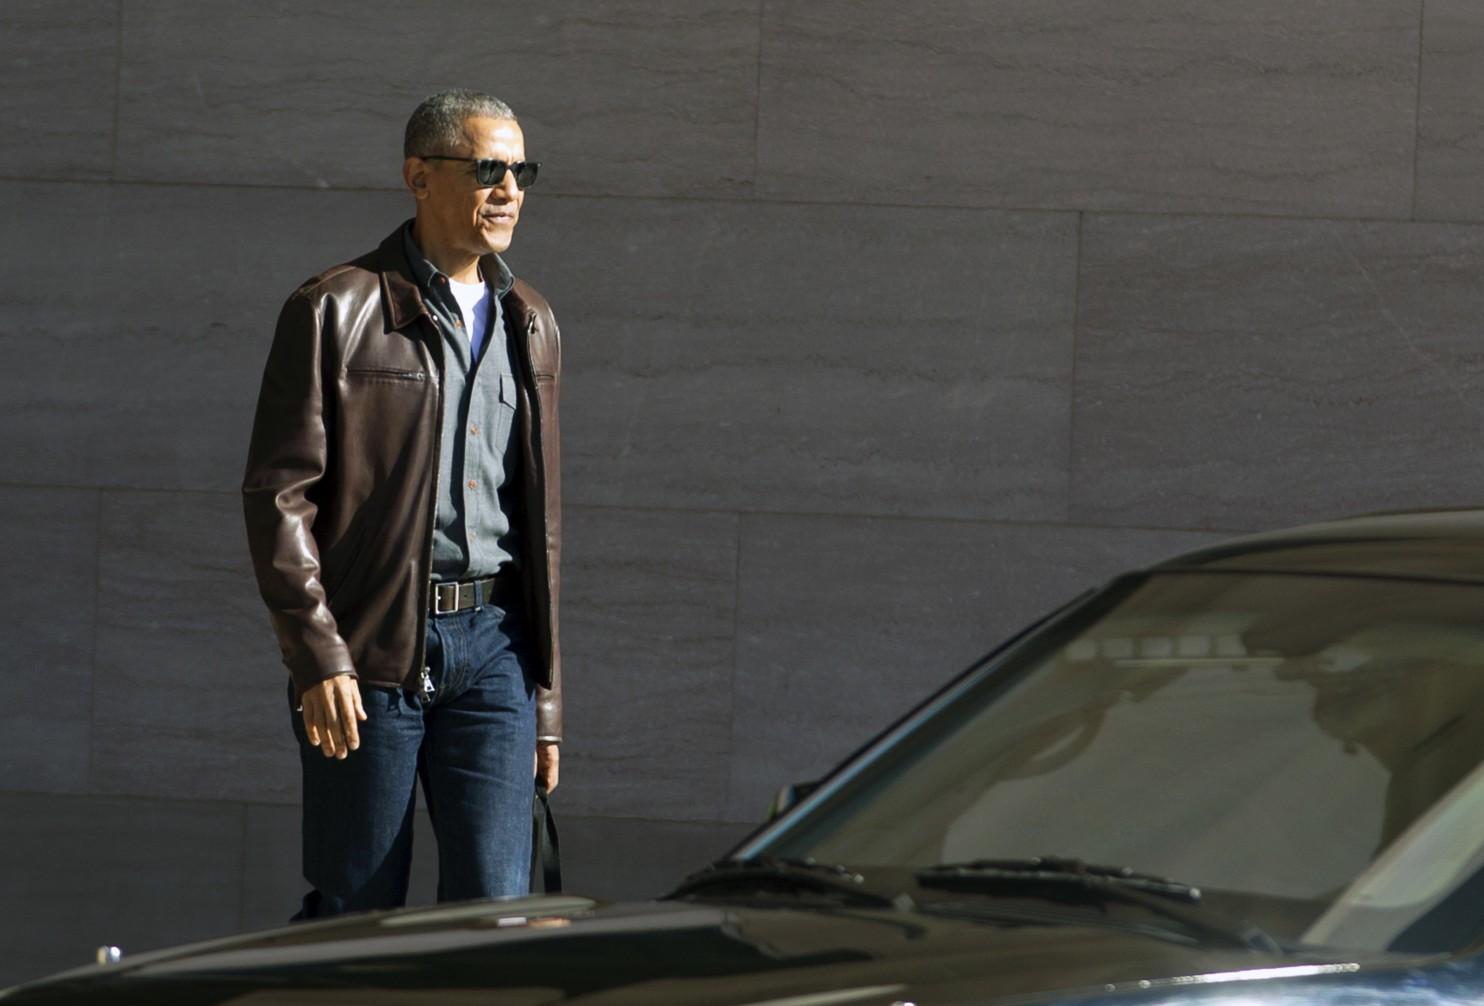 Obama_65110-4dbb4.jpg